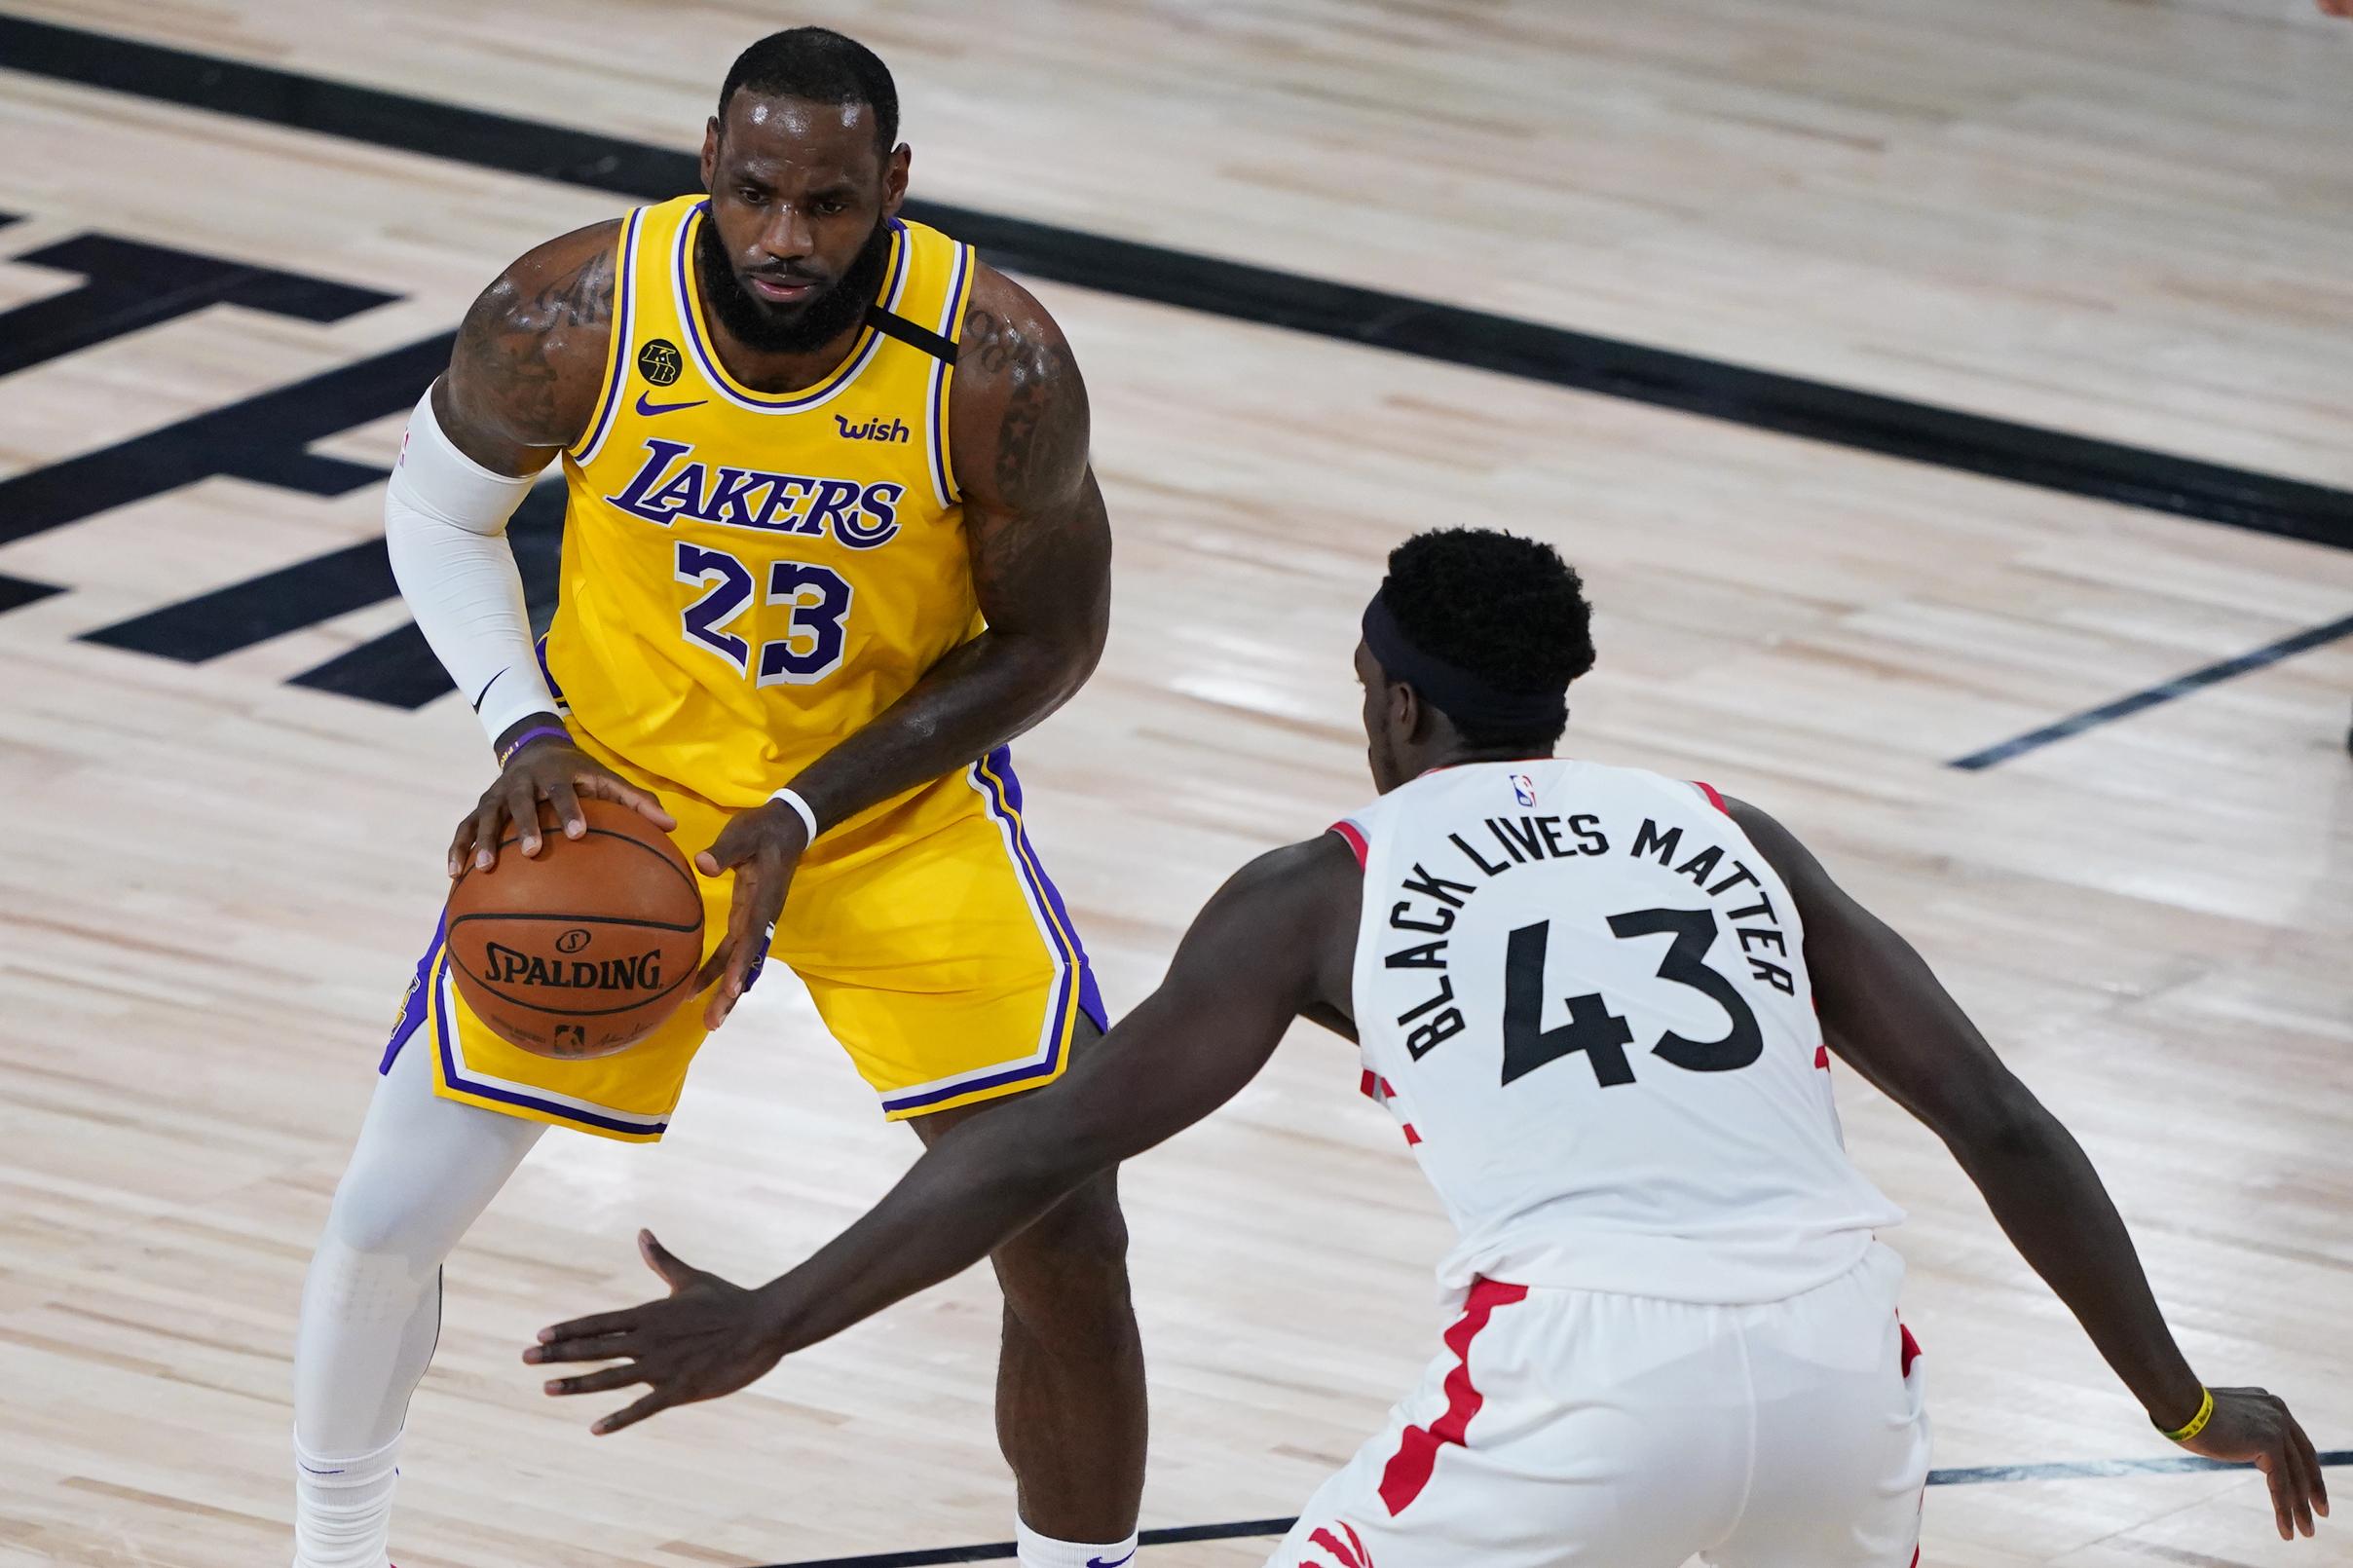 Nba Playoffs 2020 Updated Odds Predictions For Nba Finals Bleacher Report Latest News Videos And Highlights